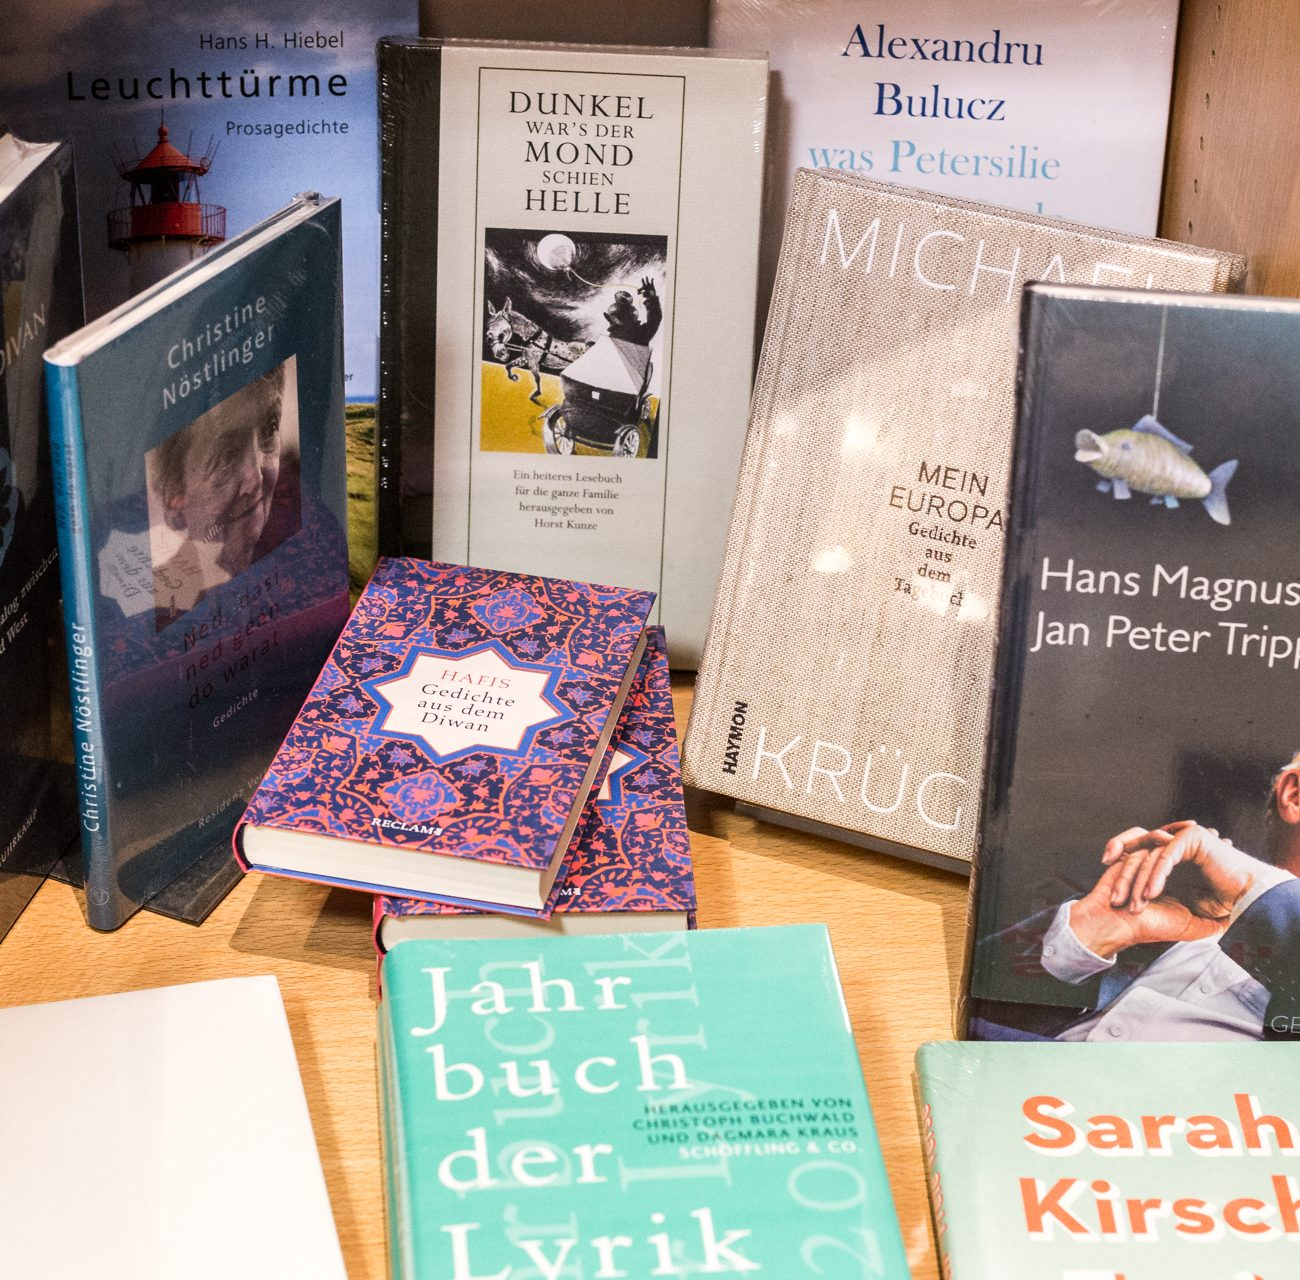 Lyrik | Parkbuchhandlung | Bücherregal | Gedichte | Poetik | Bücher